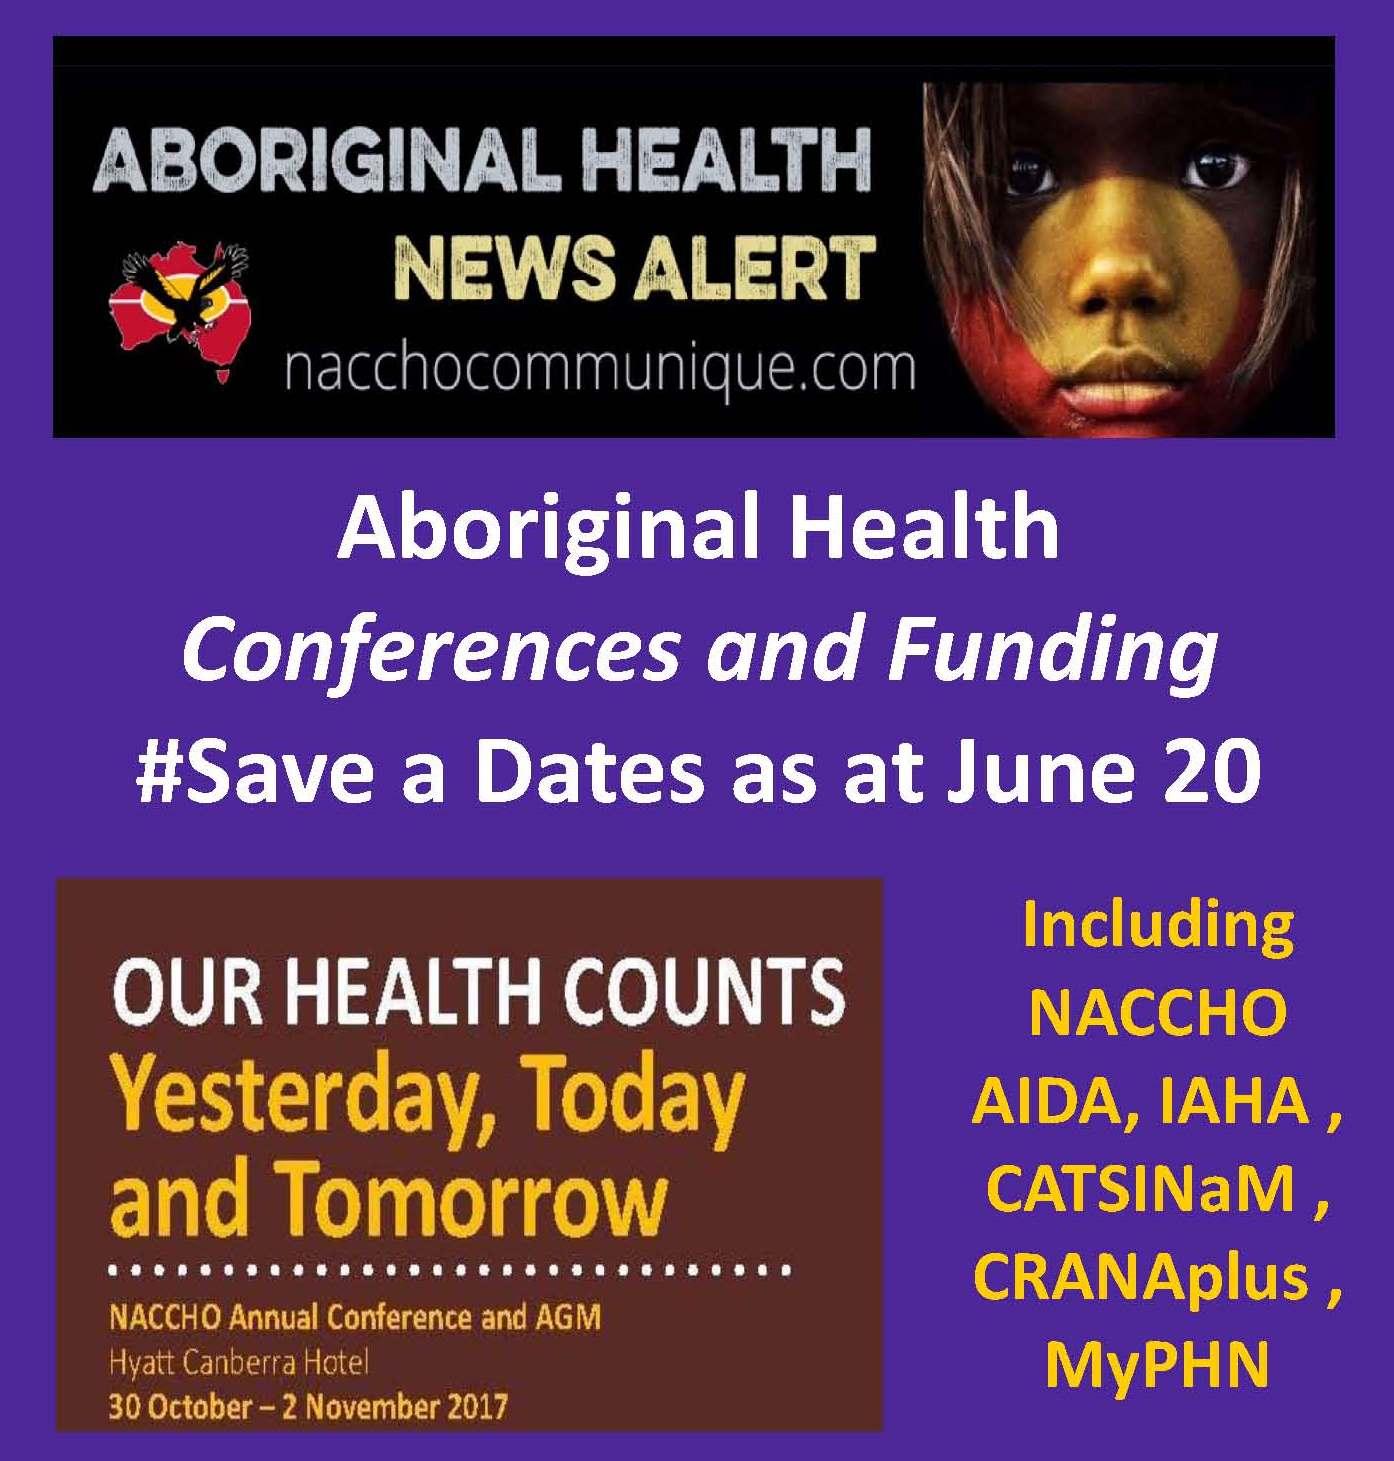 Funding awards and scholarships naccho aboriginal health news alerts naccho aboriginal health events workshops saveadate ccap17 nacchoagm17iahanational natsihwa aidaaustralia health conferences buycottarizona Gallery